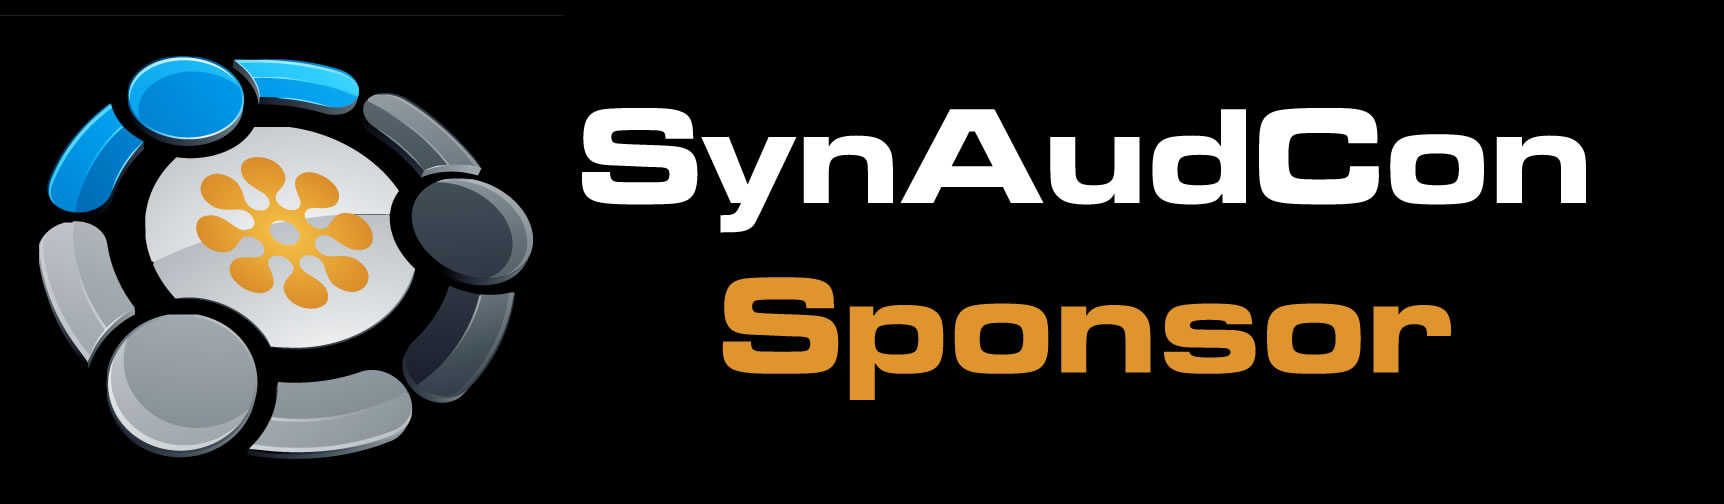 SynAudCon Sponsor Logo